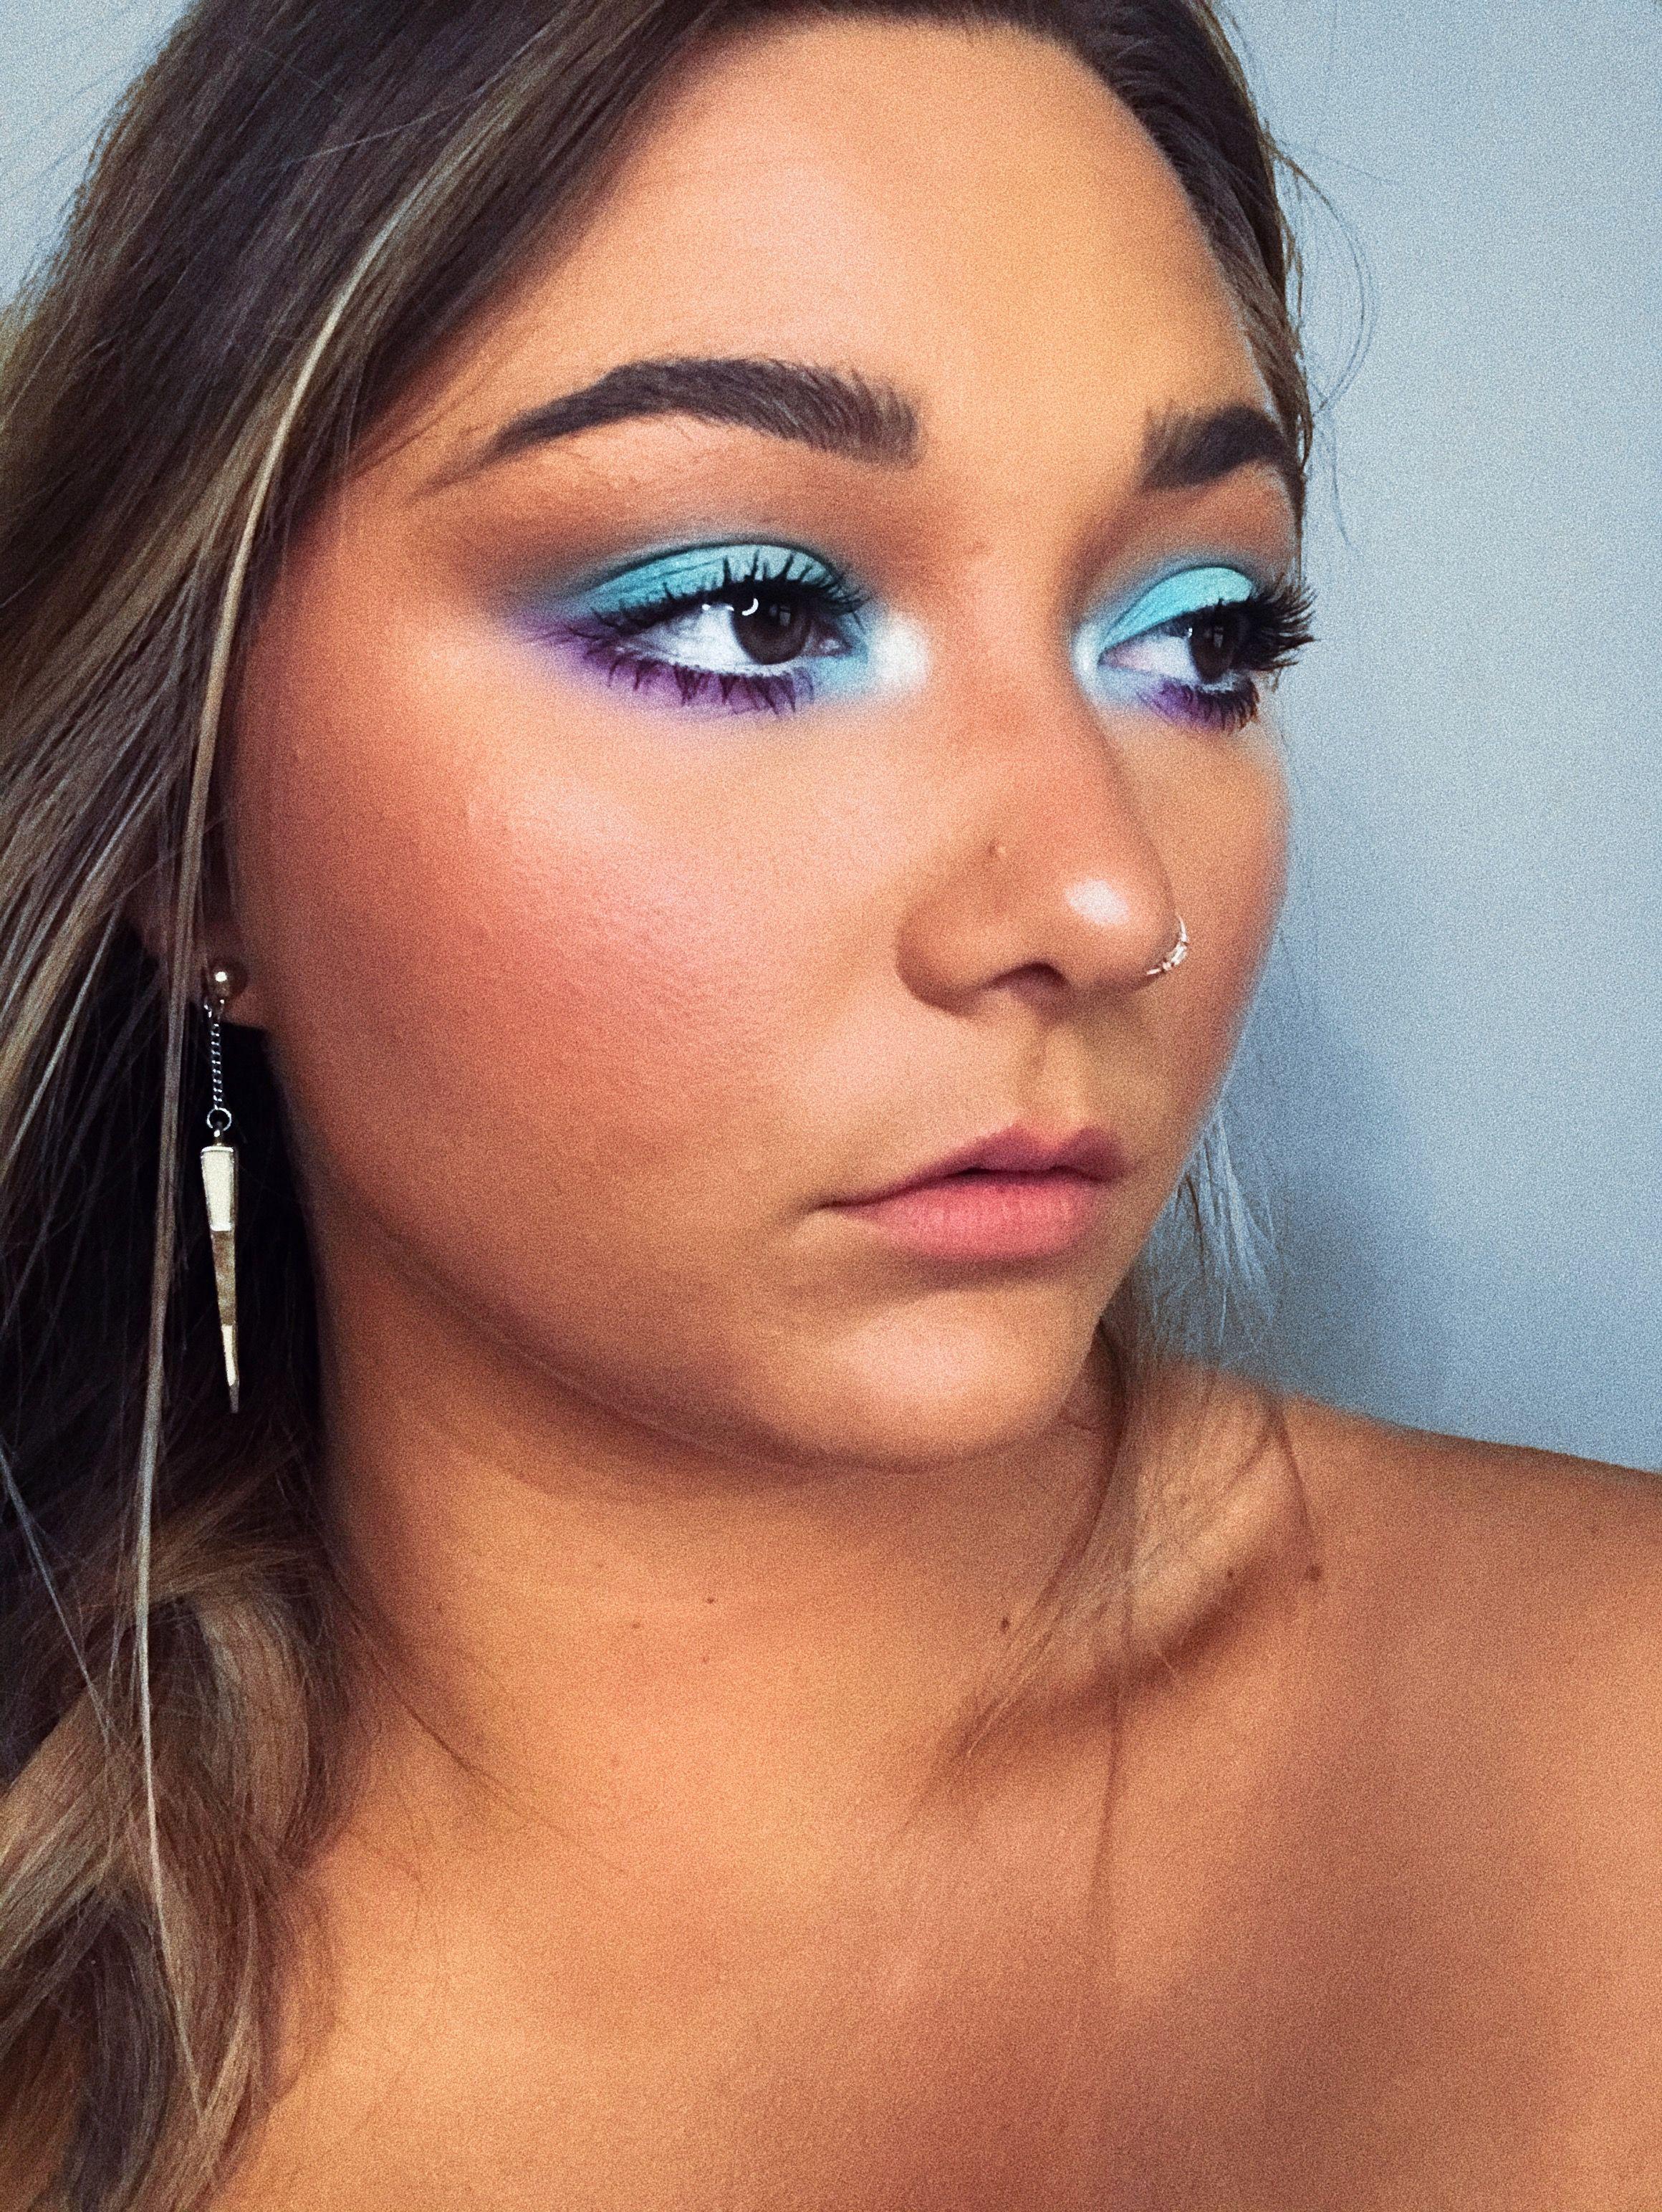 Up close + personal eye makeup in 2020 Purple eye makeup